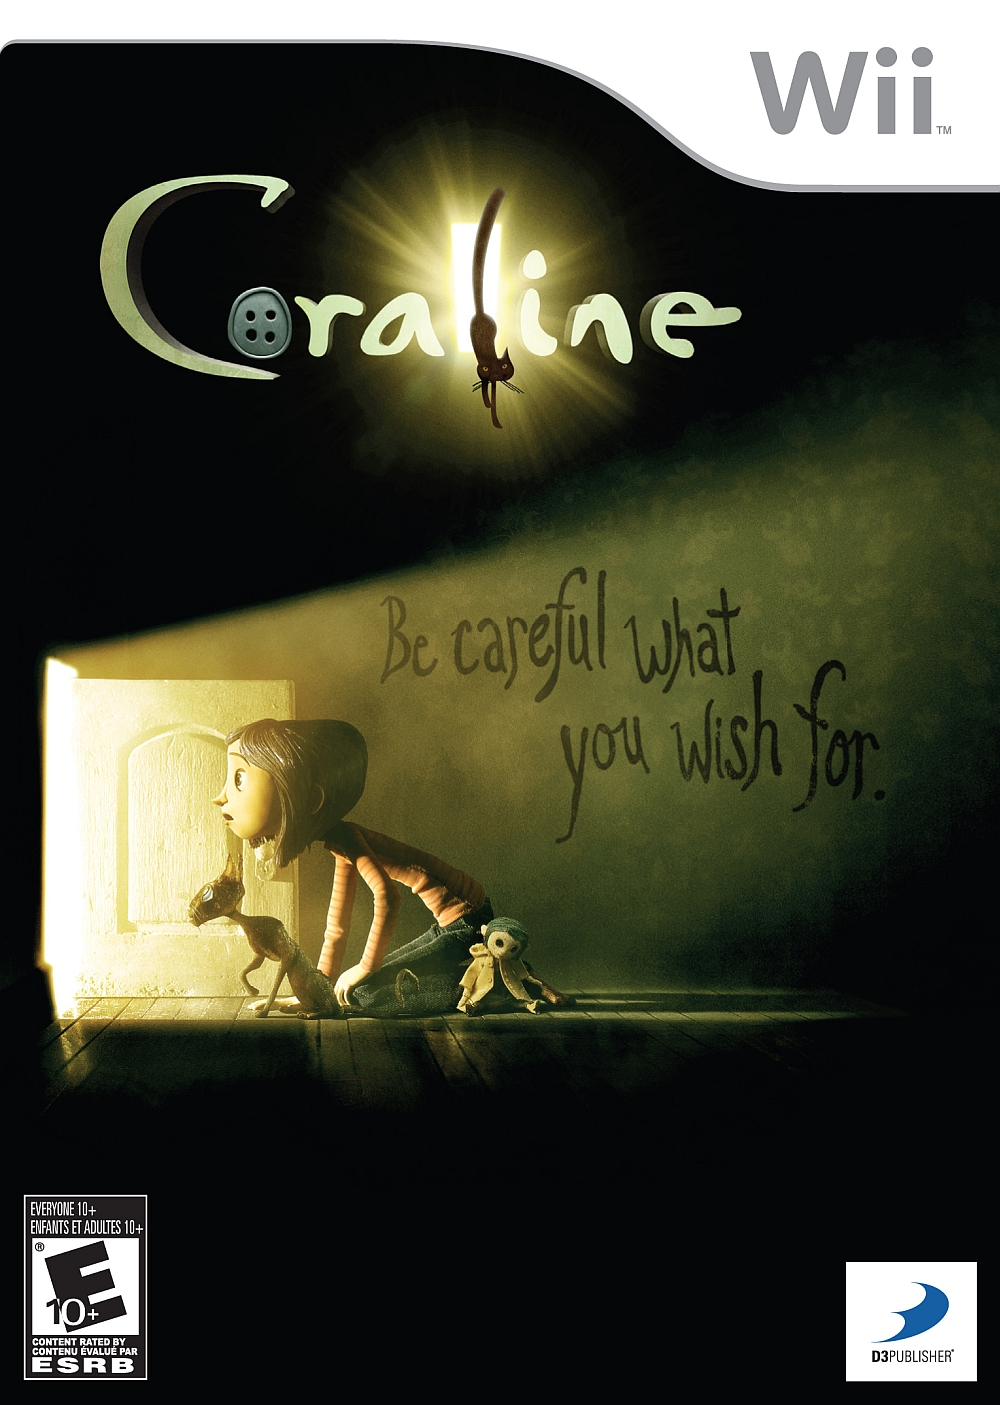 Coraline (video game)